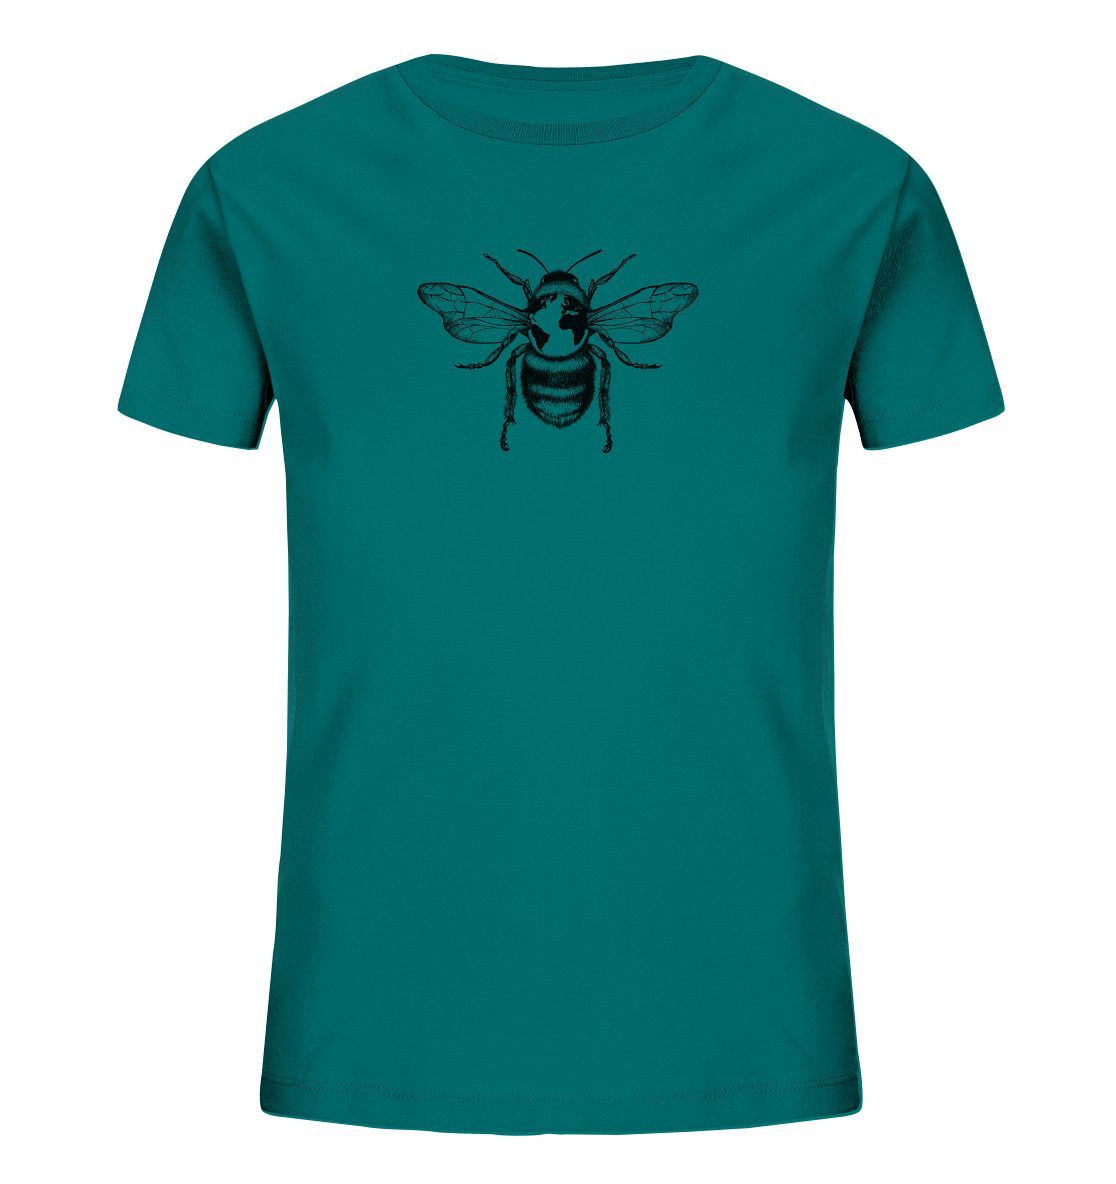 front-kids-organic-shirt-007373-1116x-2.png